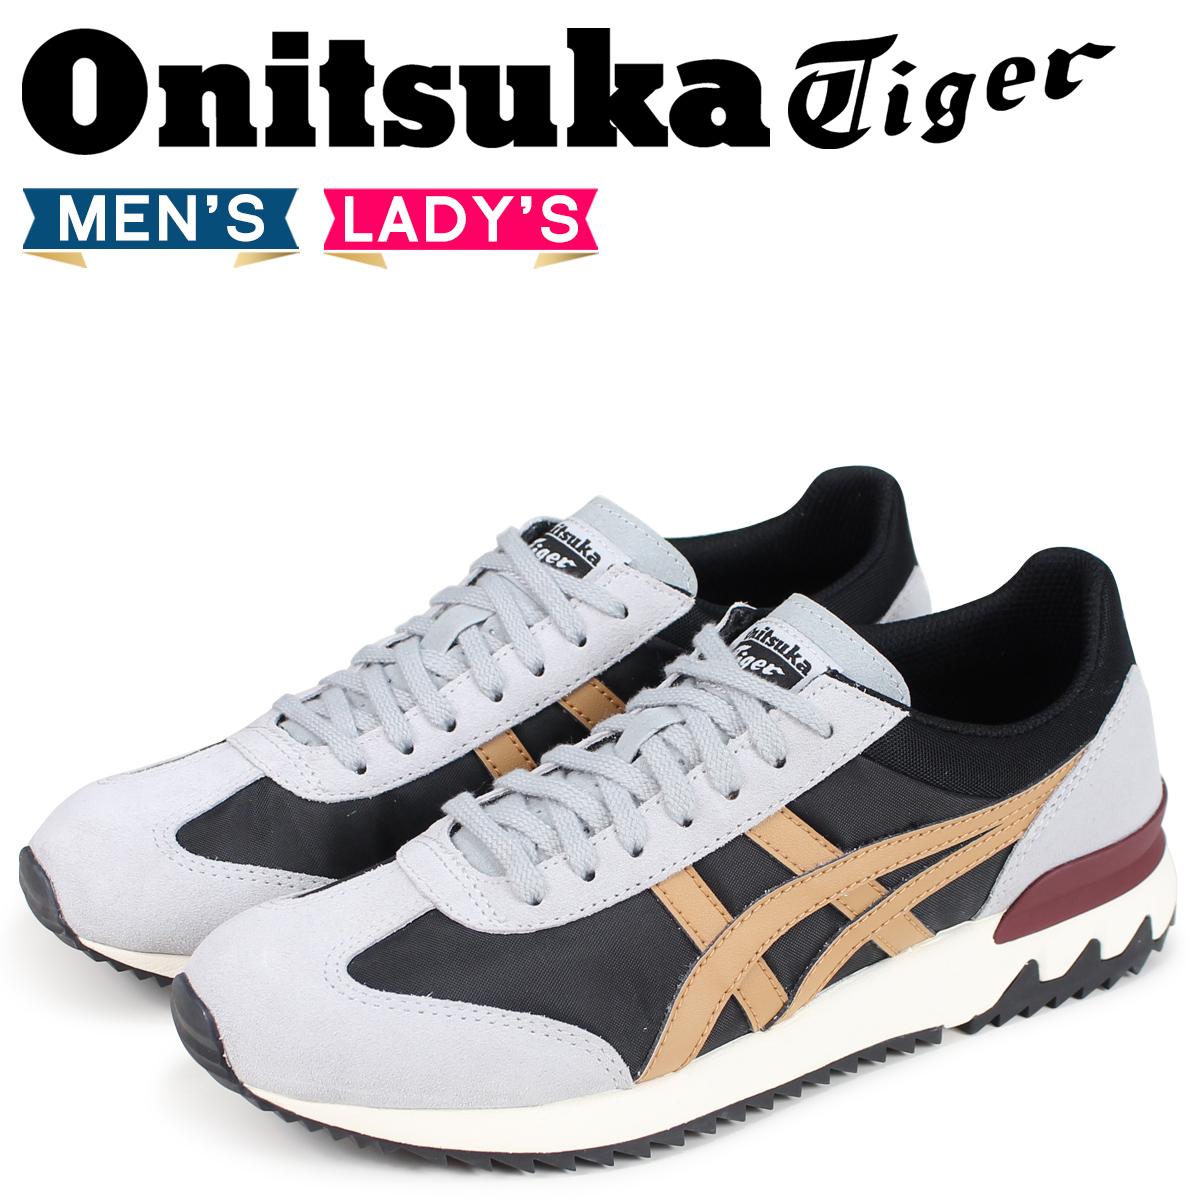 low priced 5b014 748ea Onitsuka Tiger California Onitsuka tiger CALIFORNIA 78 EX men gap Dis  sneakers 1183A194-001 black black